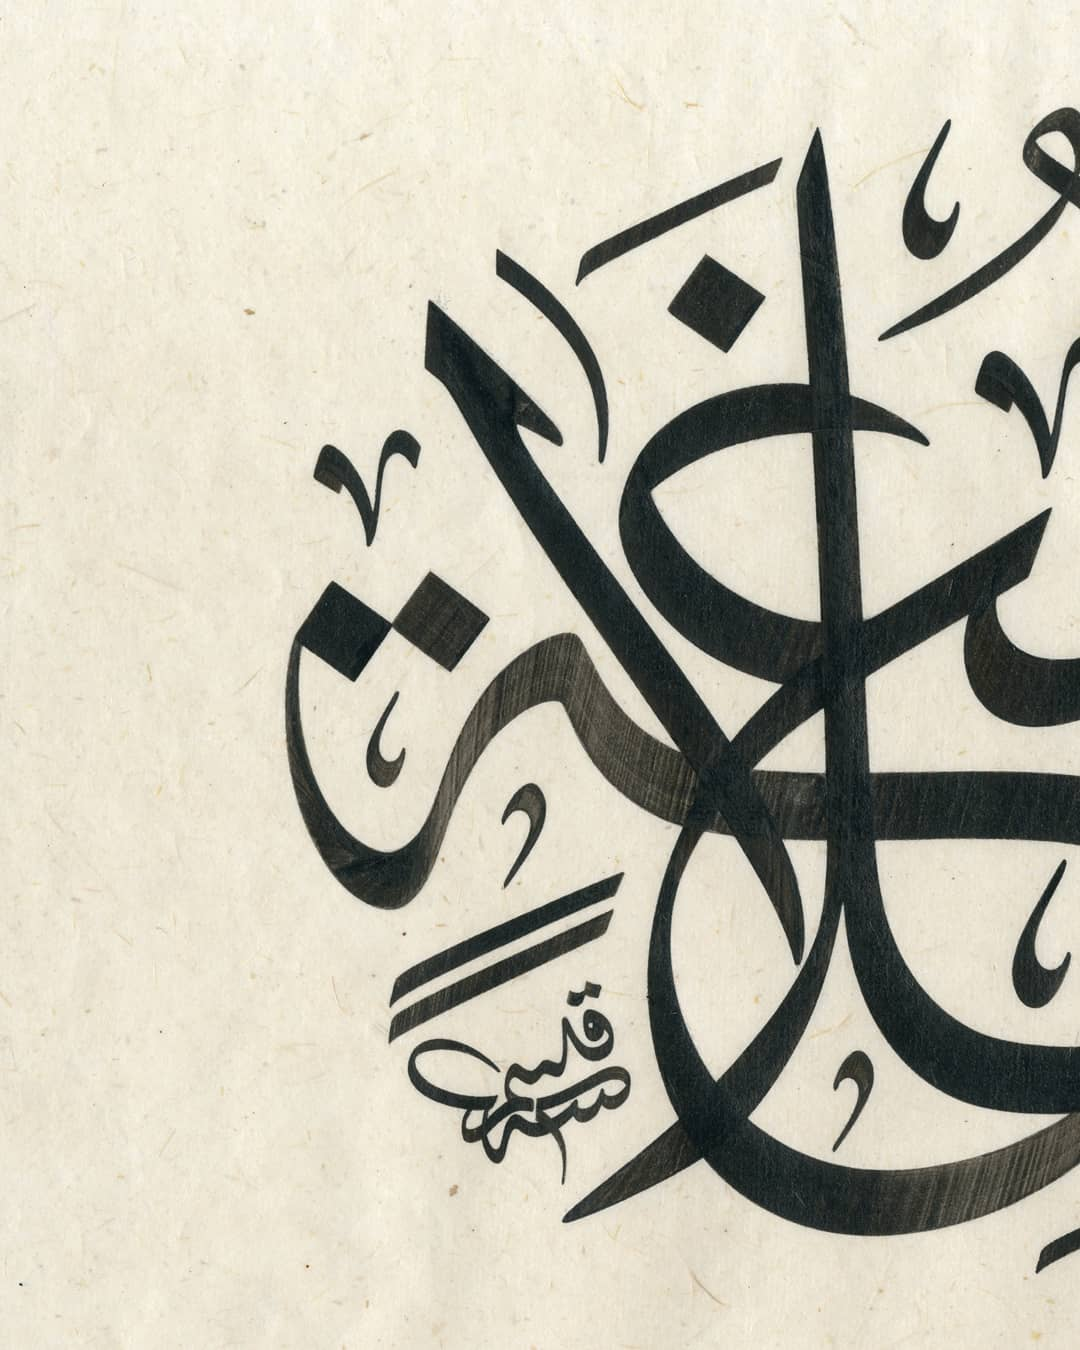 Hattat Kasım Kara قاسم قاره  Sabır dili olmayan en güzel duadır… الصبراجمل دعاءبلالغة #hattat #islamicart #… 637